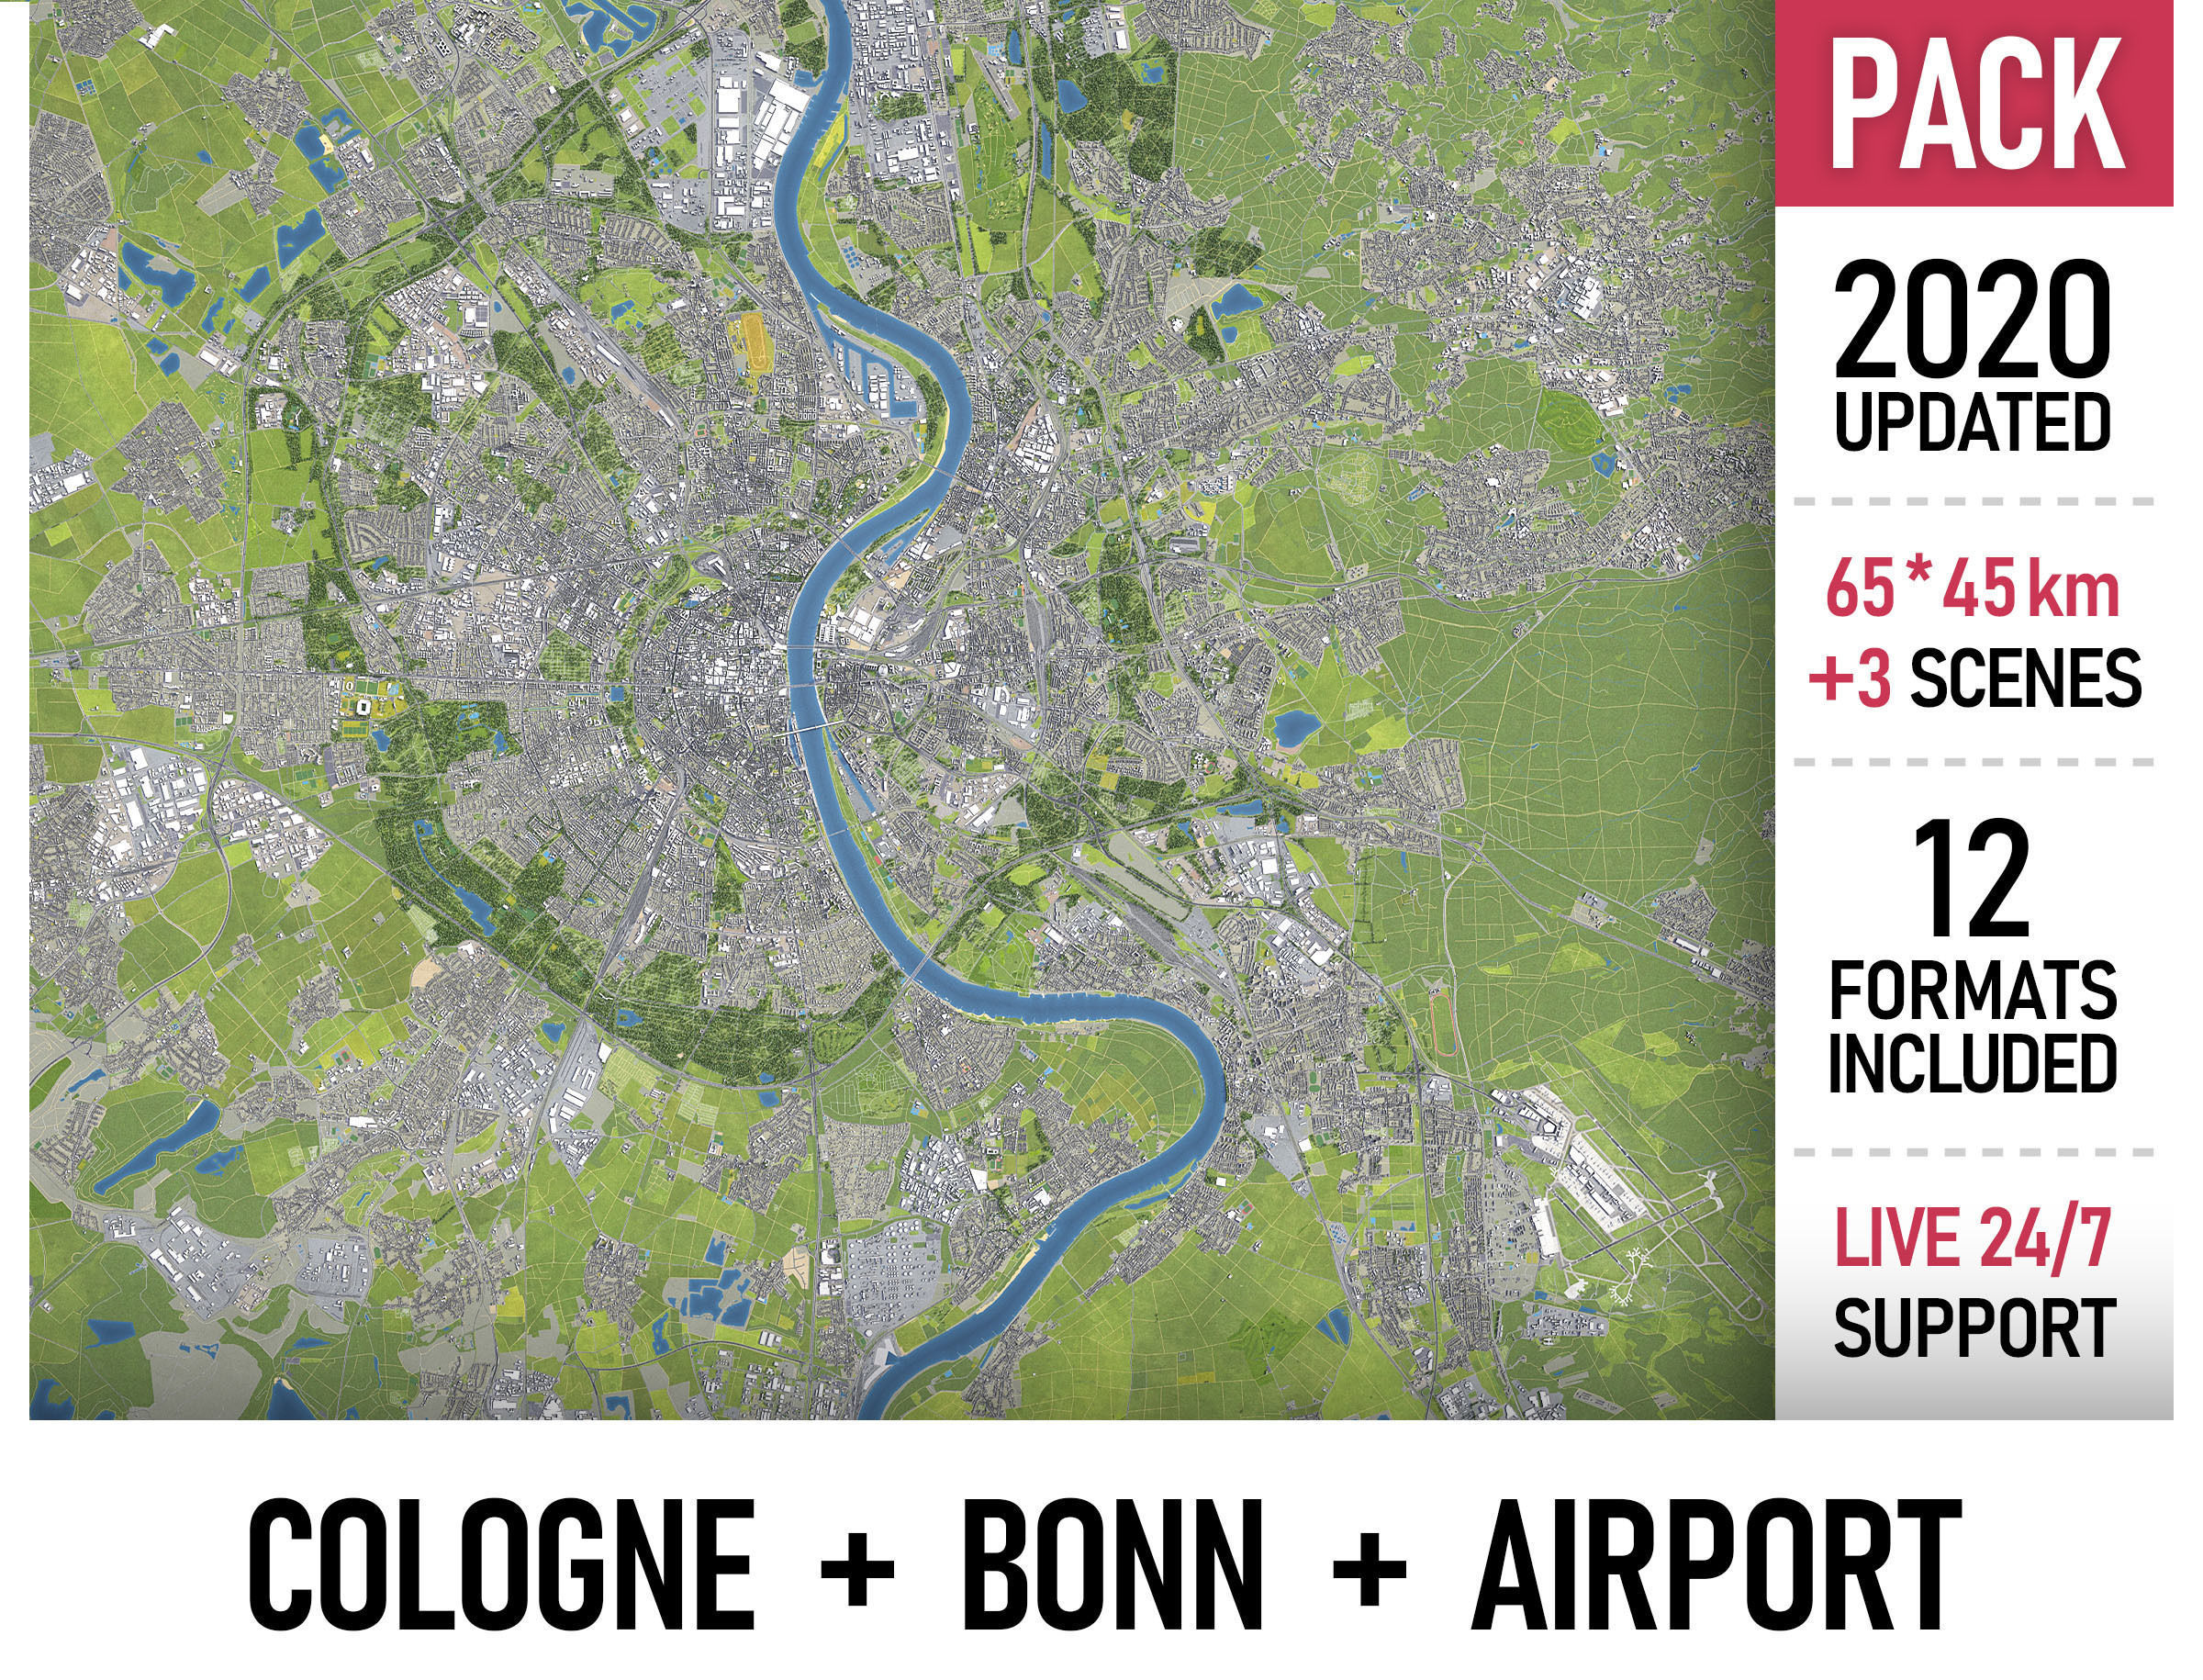 Cologne - Bonn - CGN Airport - megapack